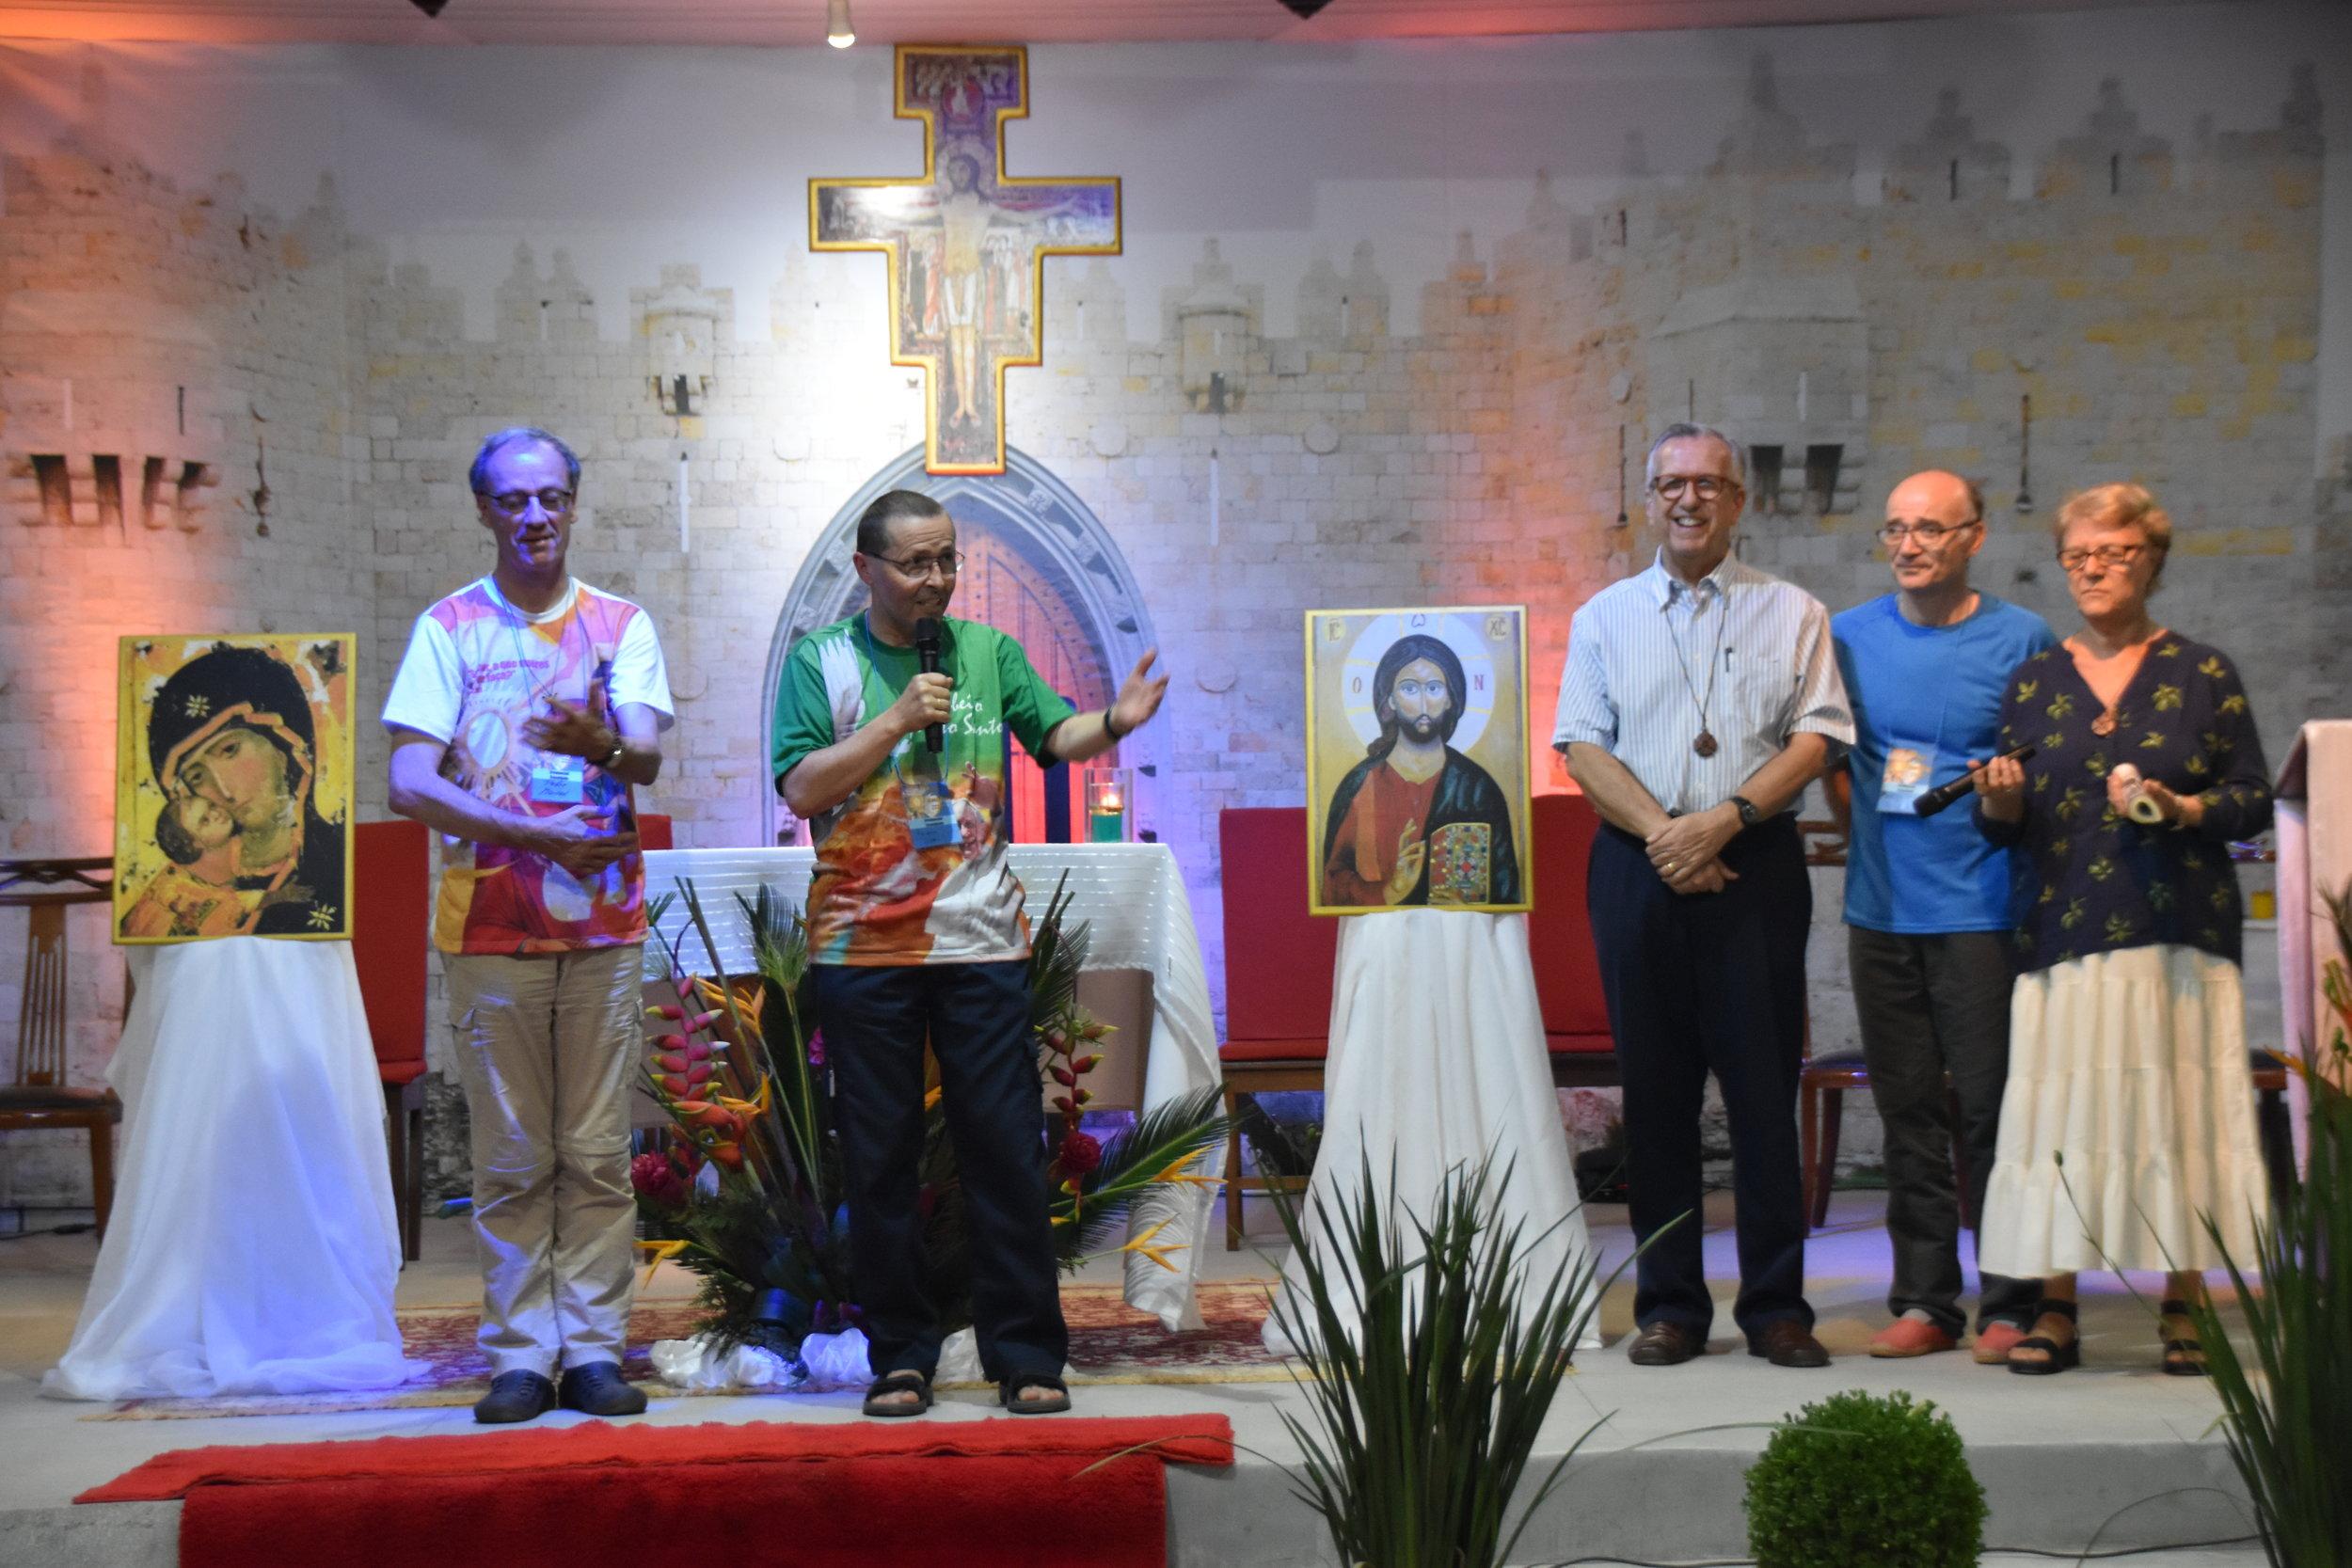 Pe. Martial,Pe. Joël Pralong, Diác. Georges Bonneval, Francisco Maria e Marie Bonneval